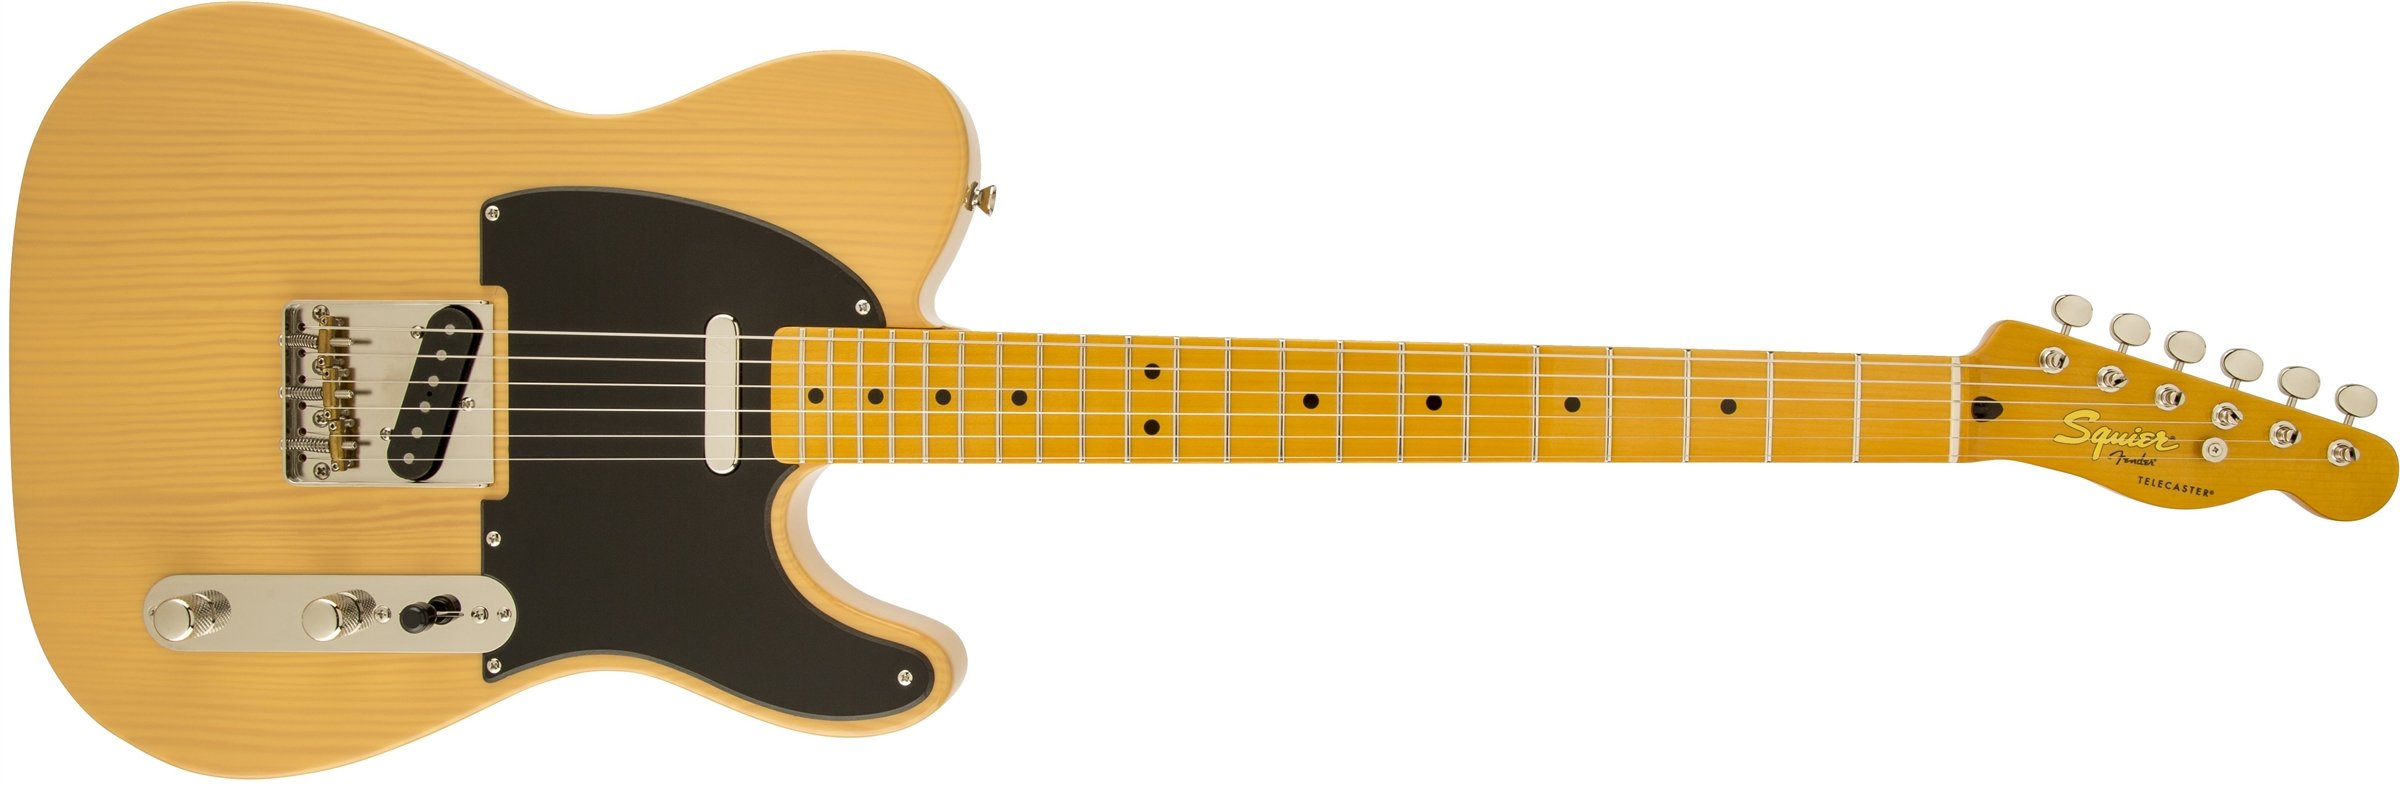 Fender Squier Classic Vibe 50s Telecaster: Amazon.es: Instrumentos musicales